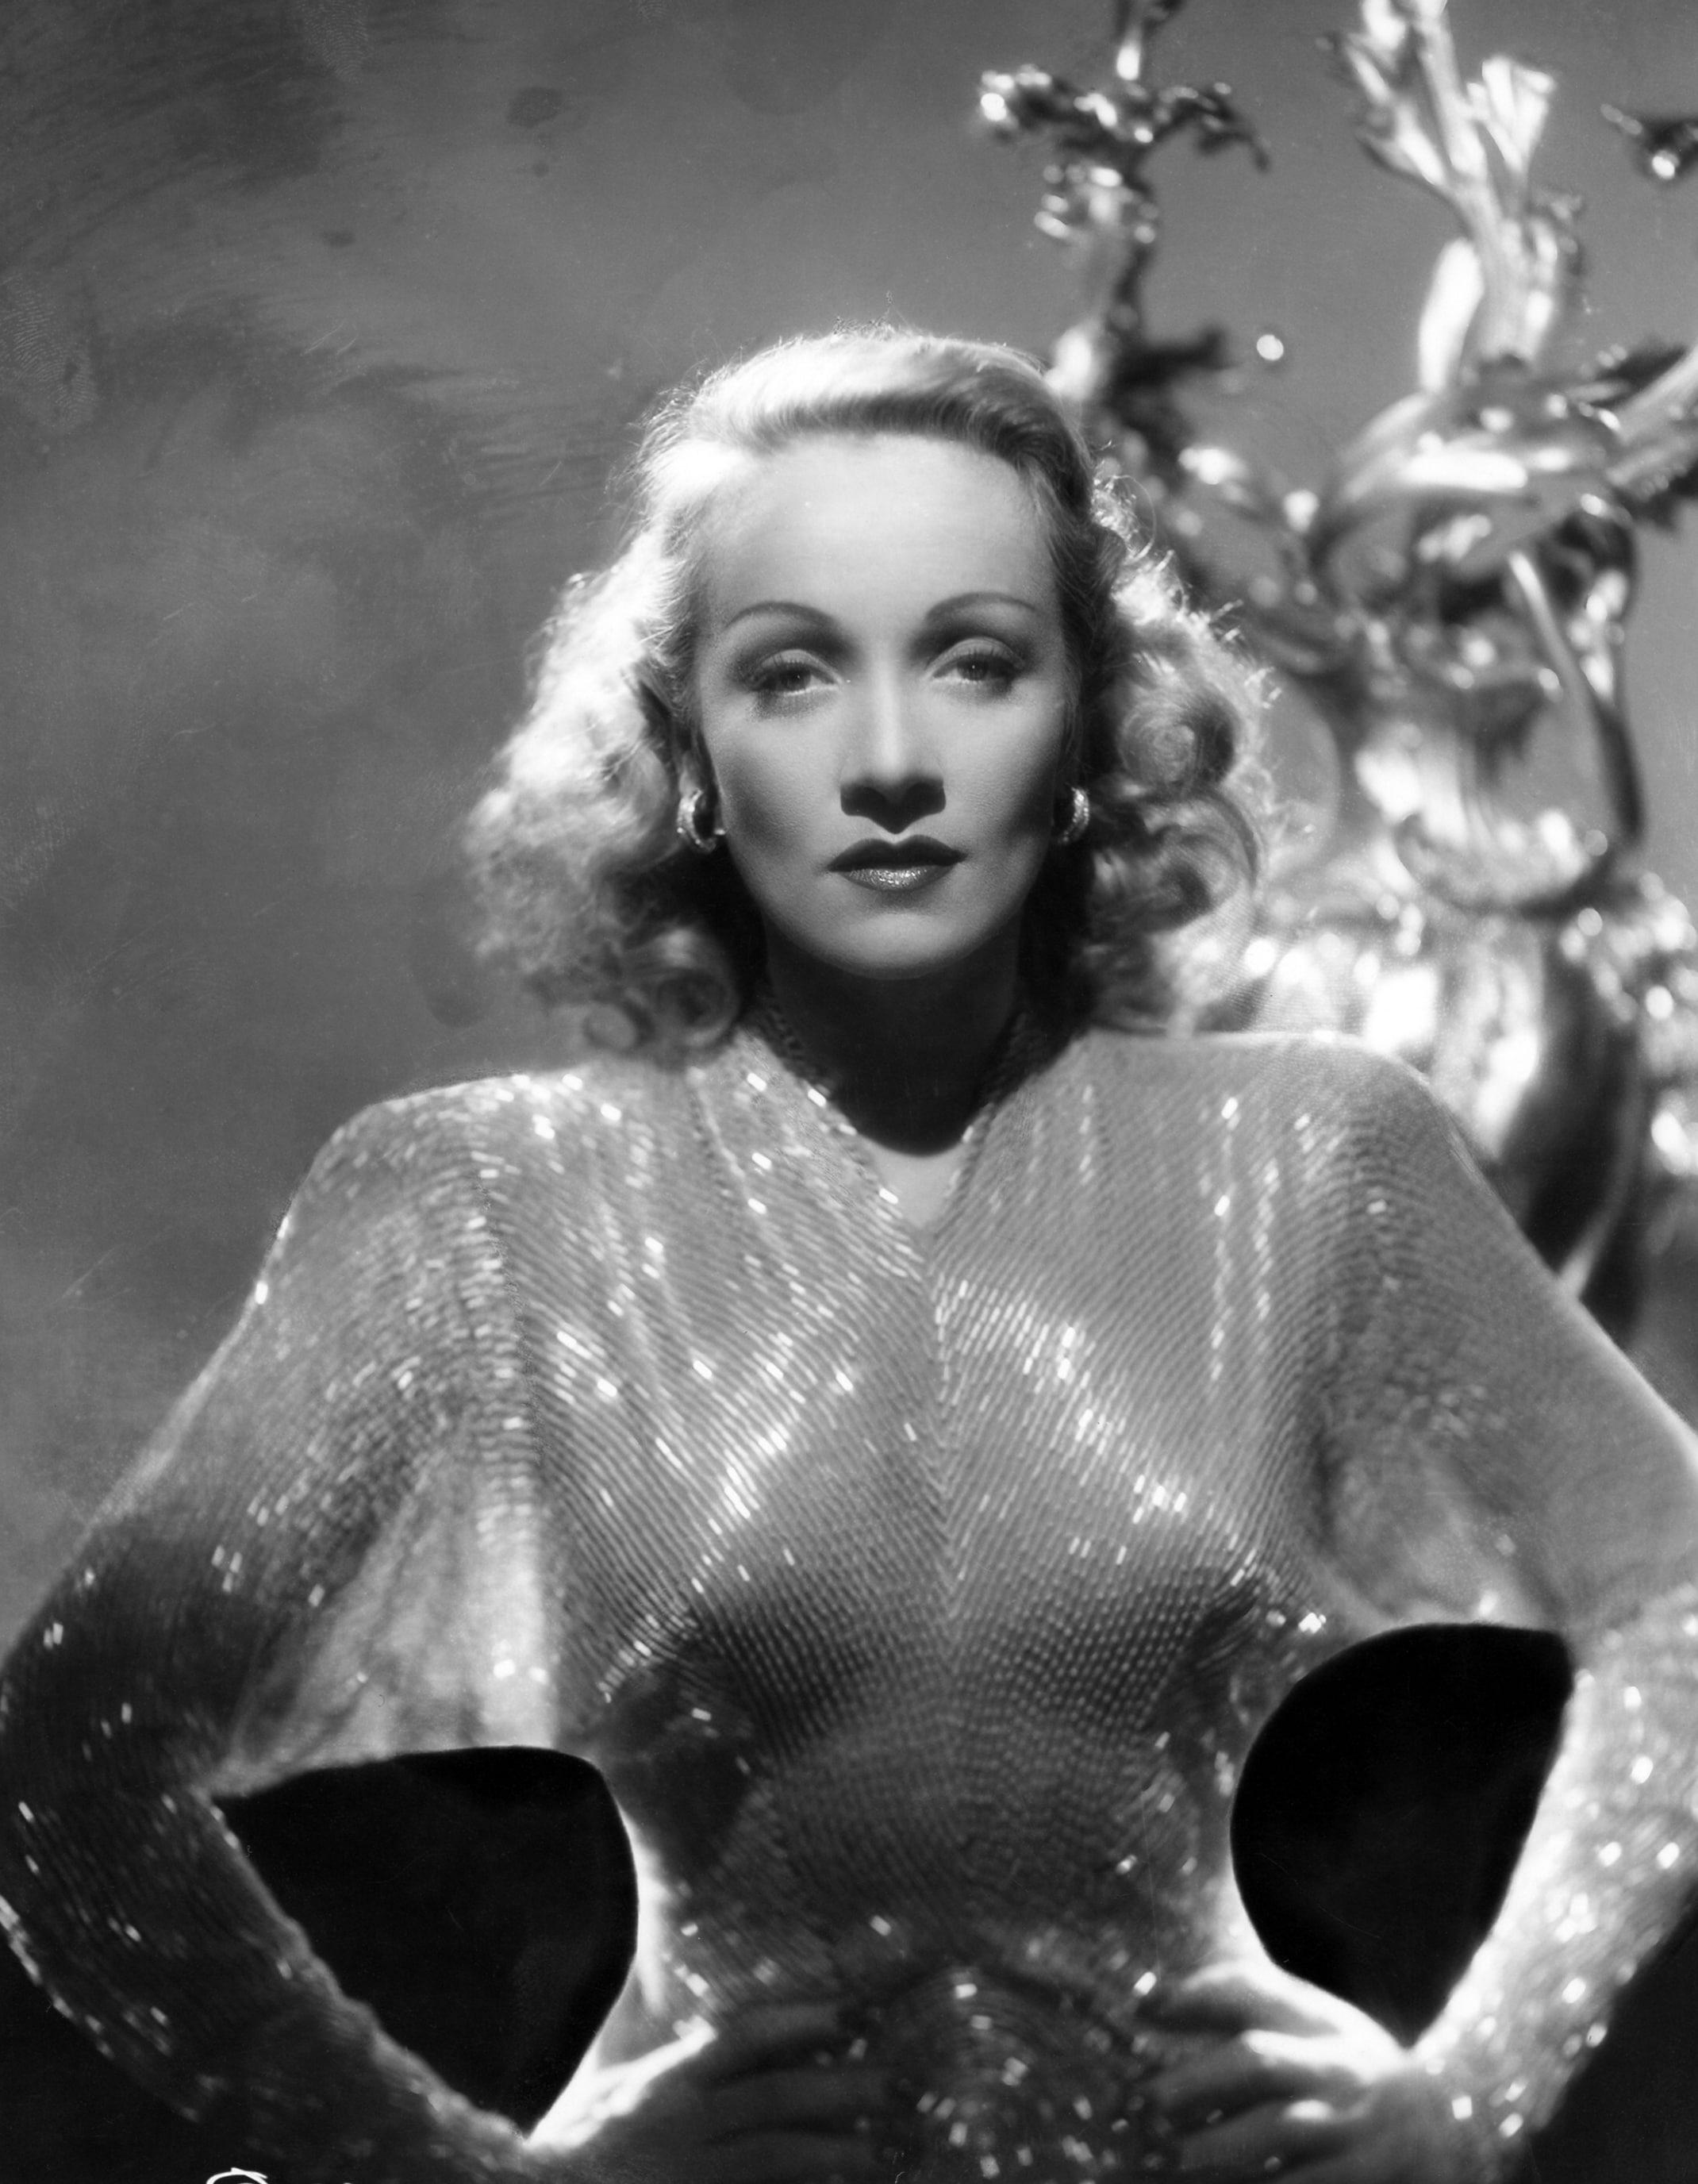 Marlene Dietrich HQ wallpapers